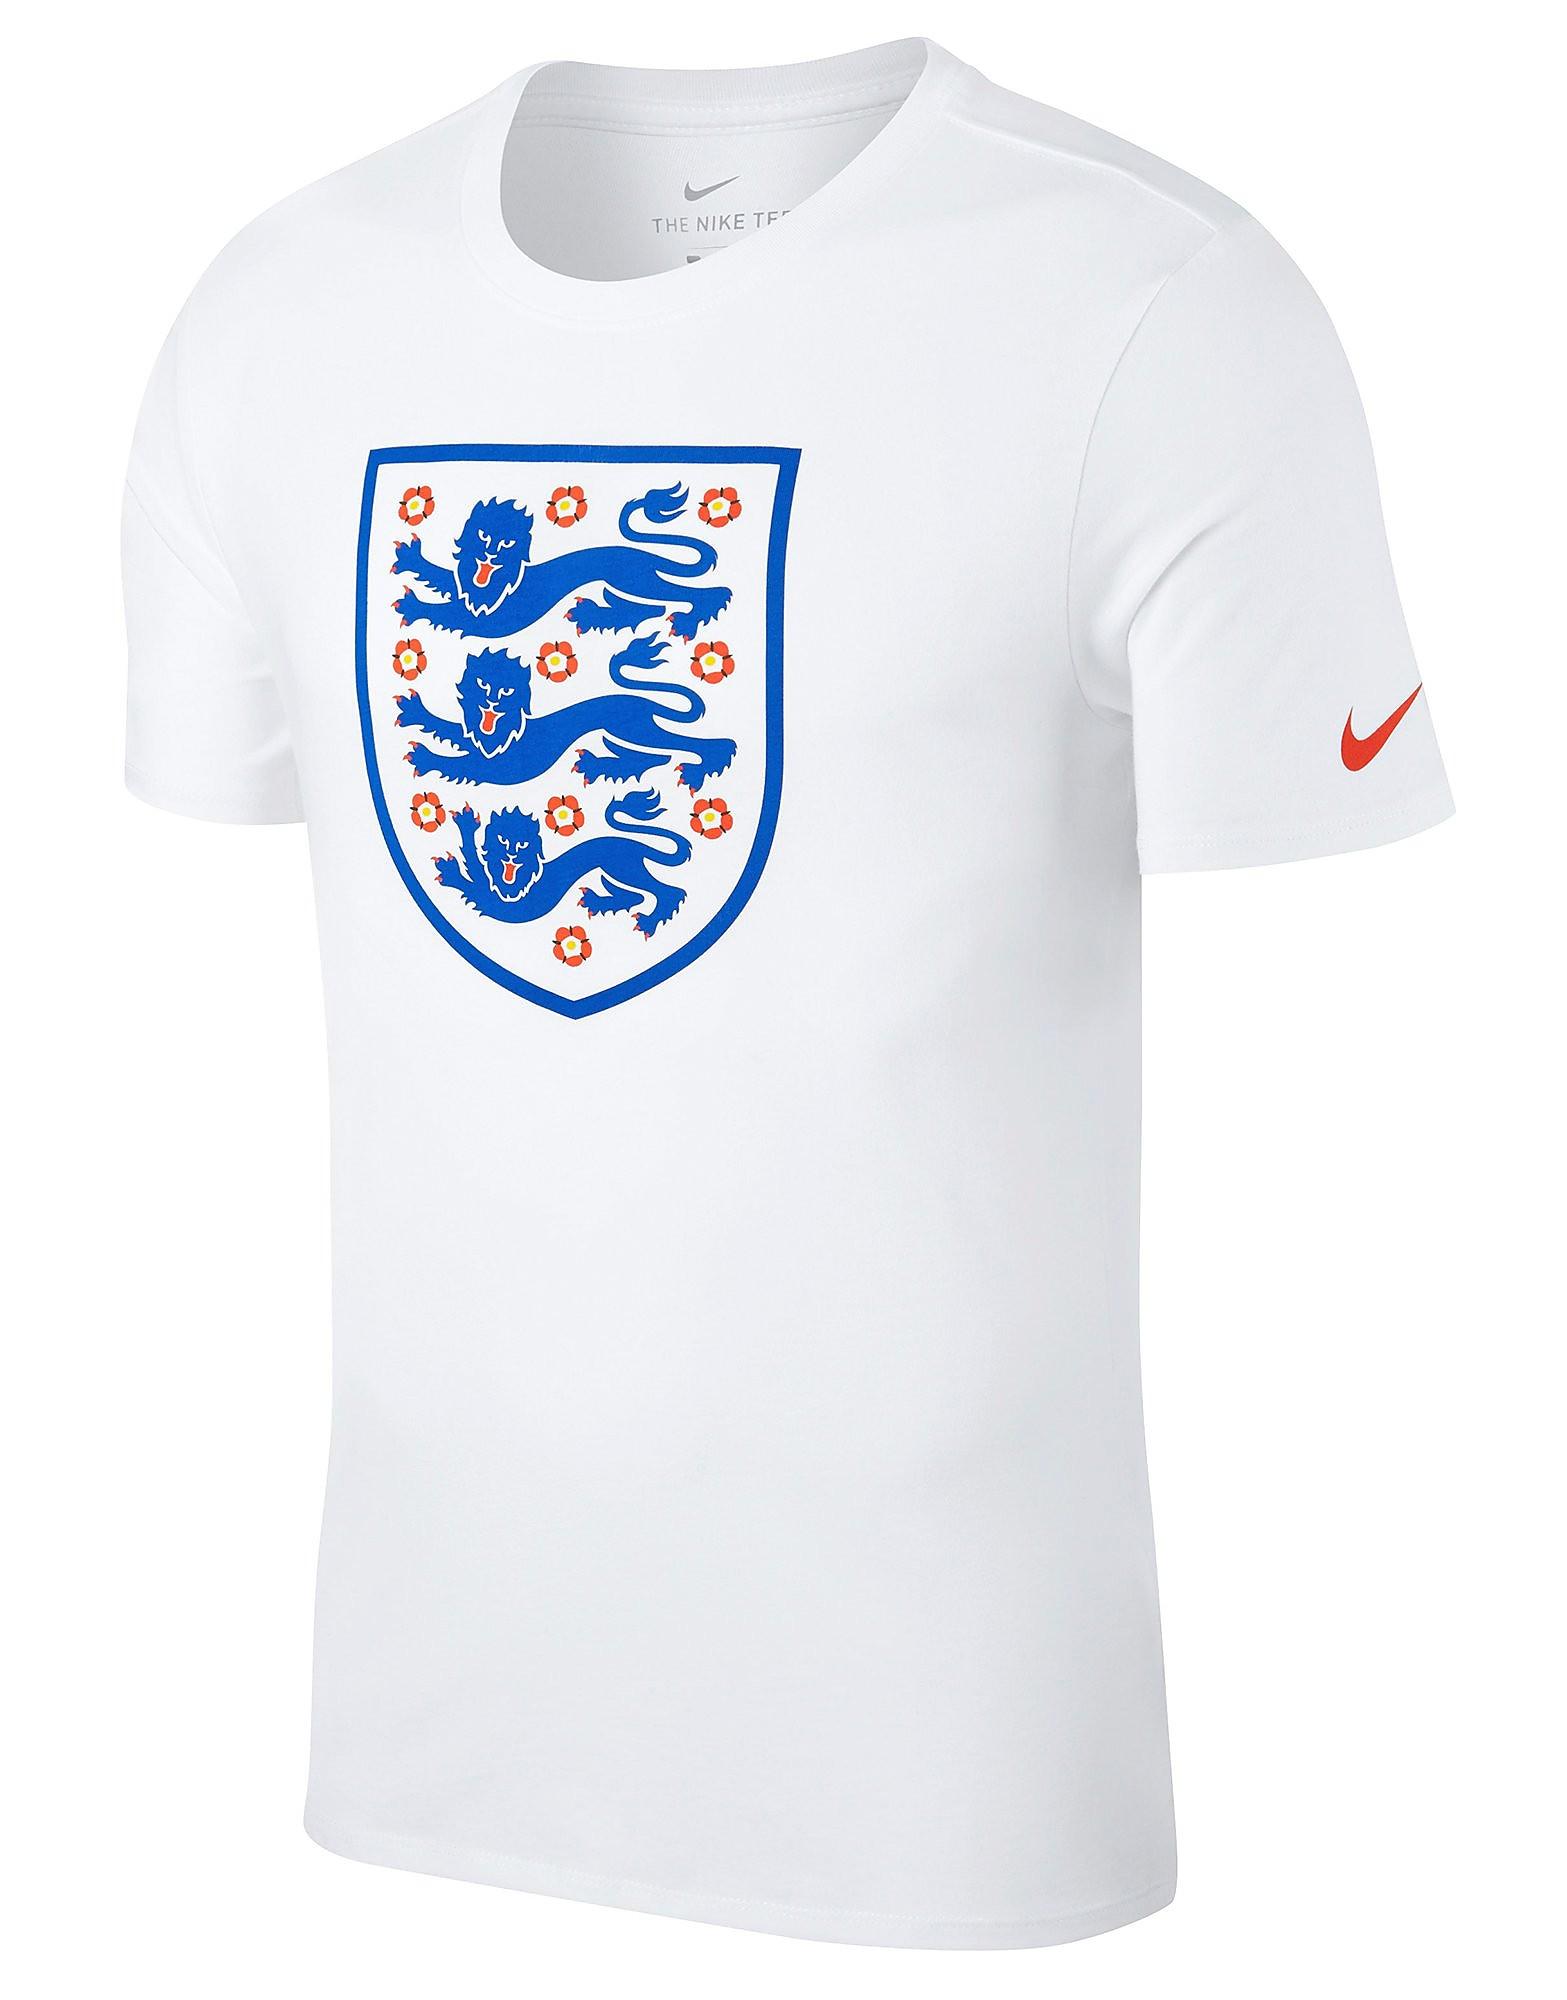 Nike T-shirt England Crest Homme